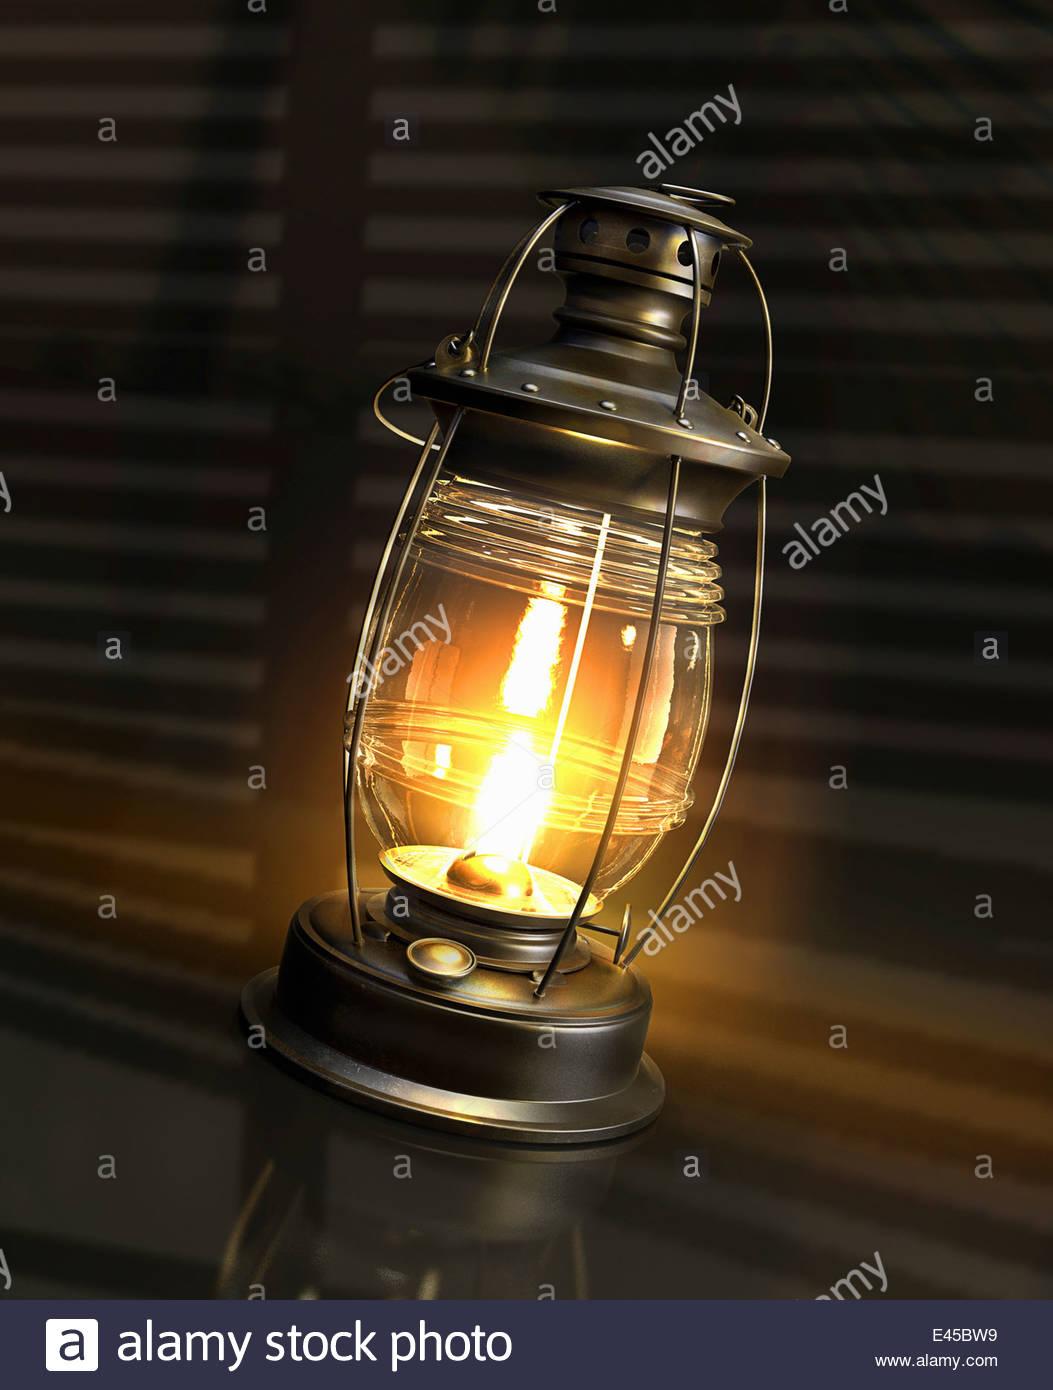 Ilumina brillante lámpara de parafina Imagen De Stock